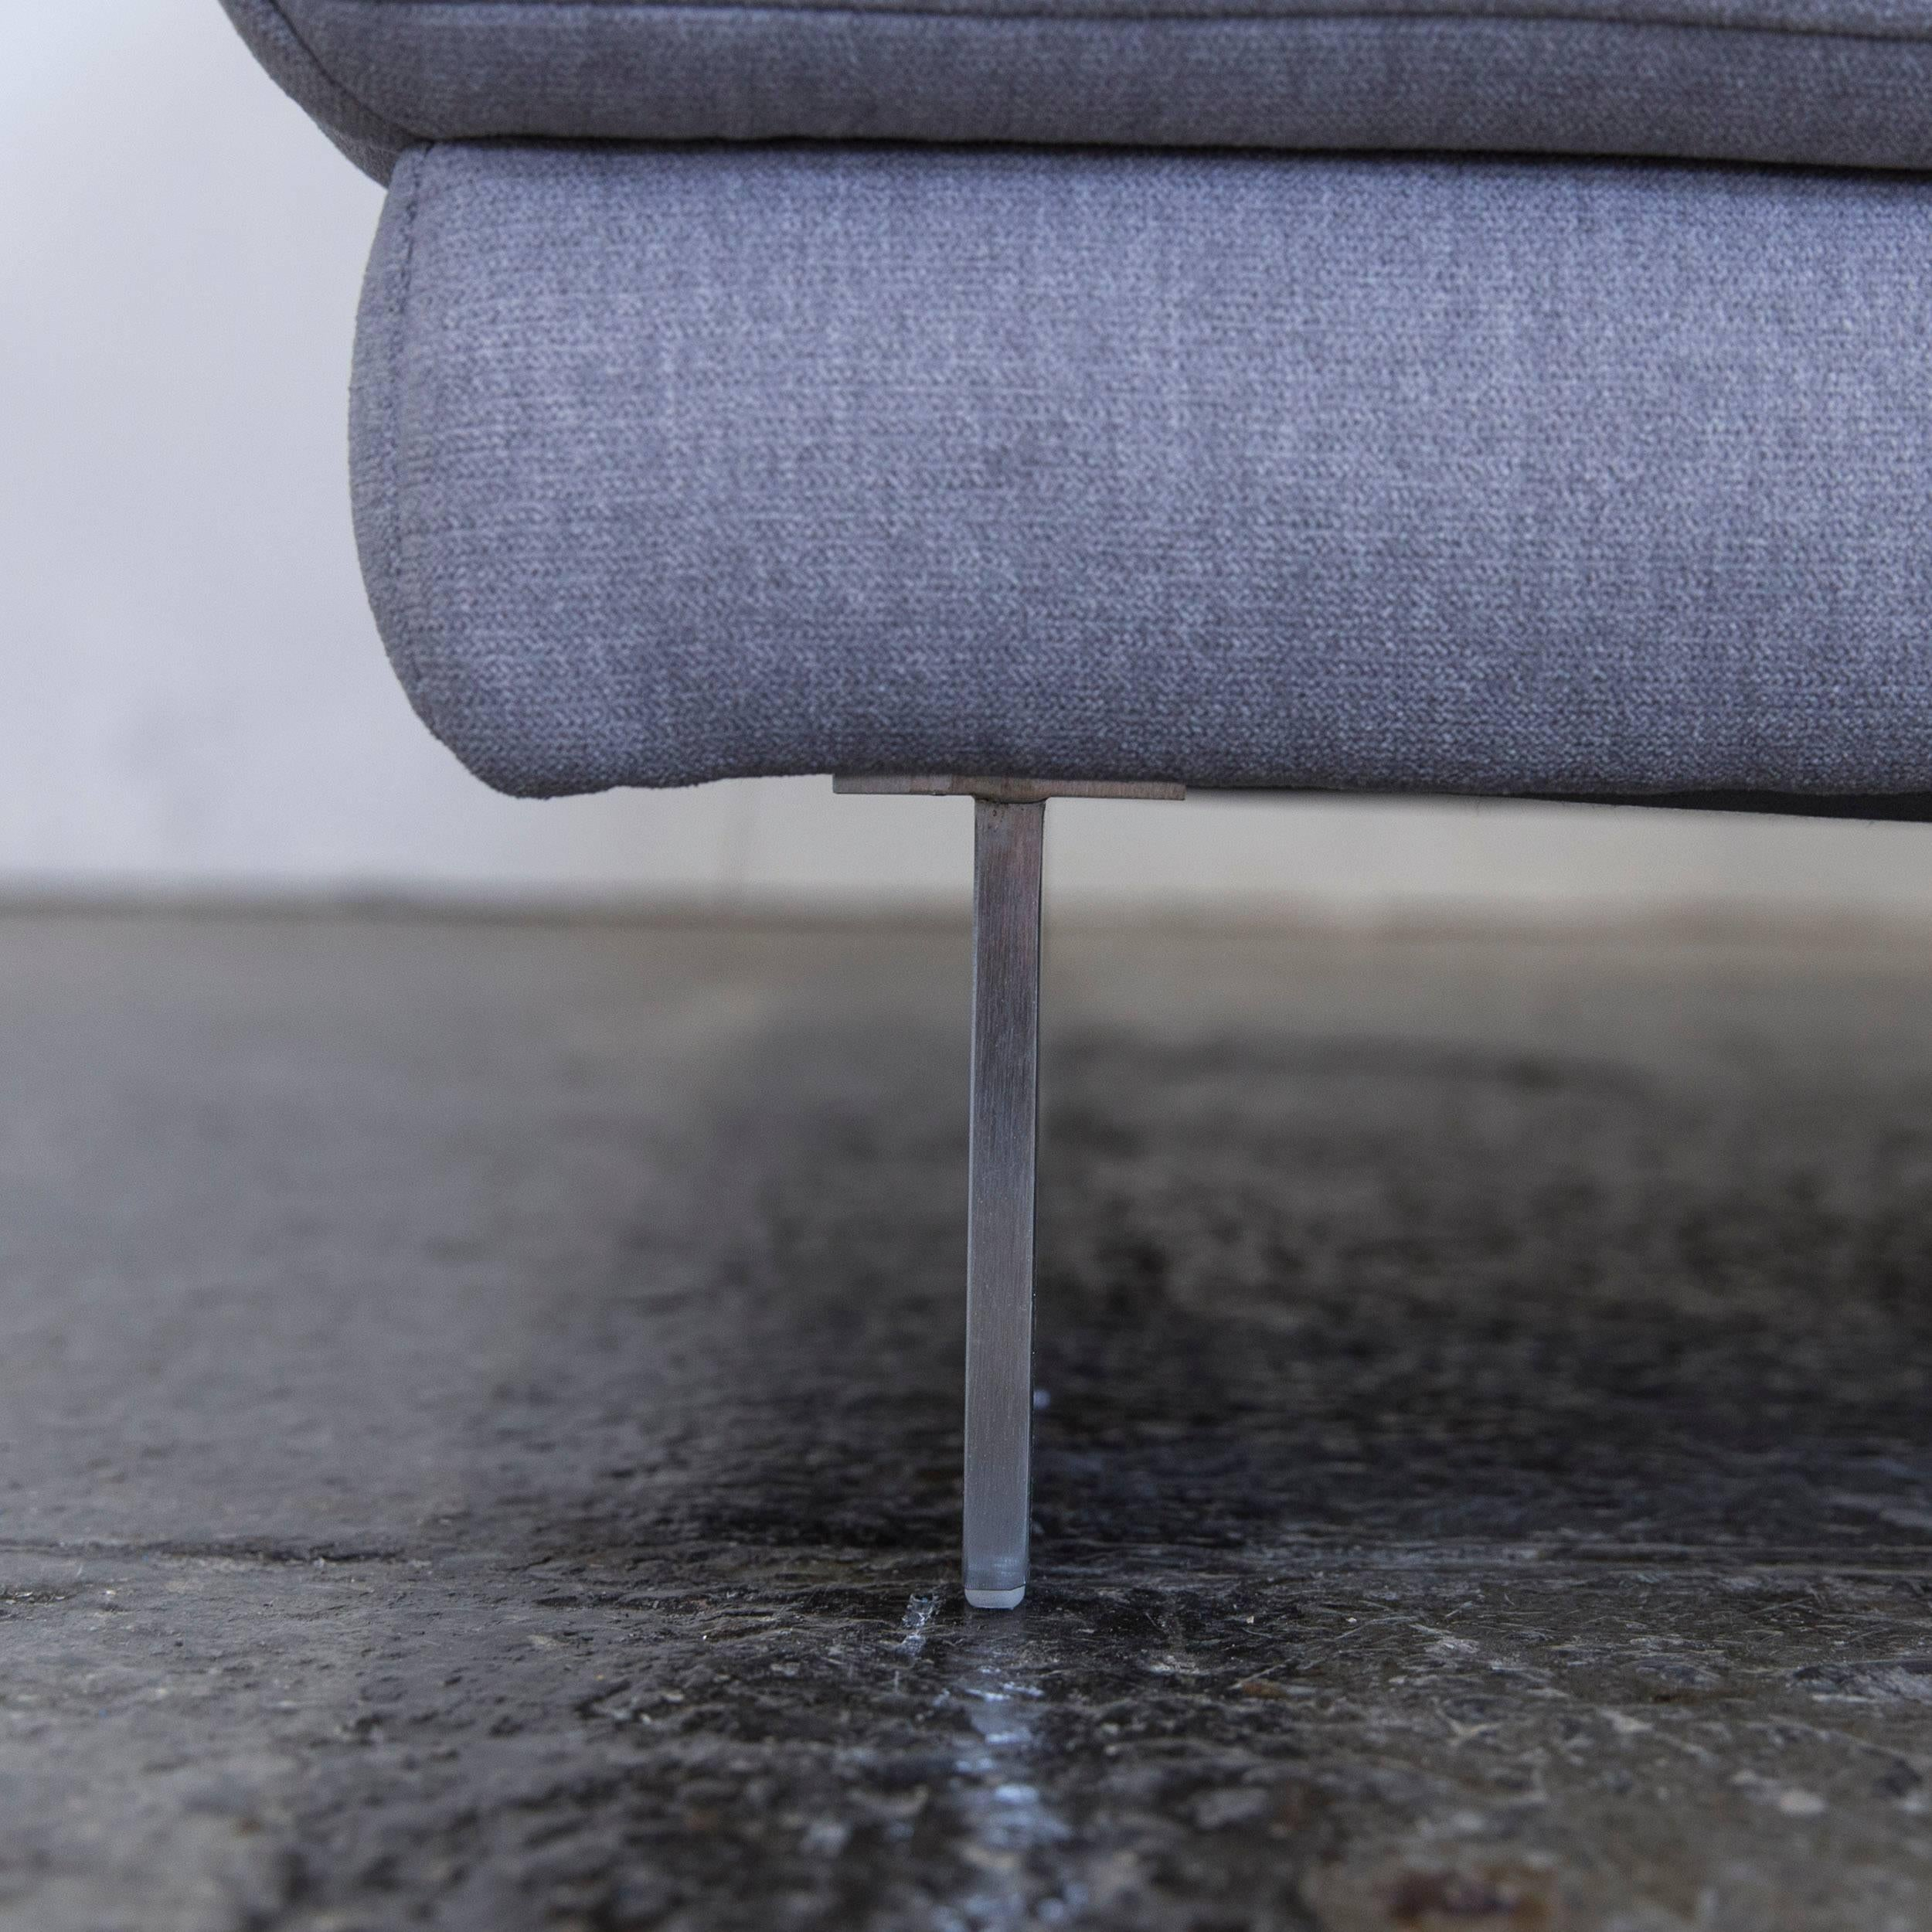 dnische polstermbel excellent awesome beautiful sofa schillig outlet neu tolle schillig sofa. Black Bedroom Furniture Sets. Home Design Ideas